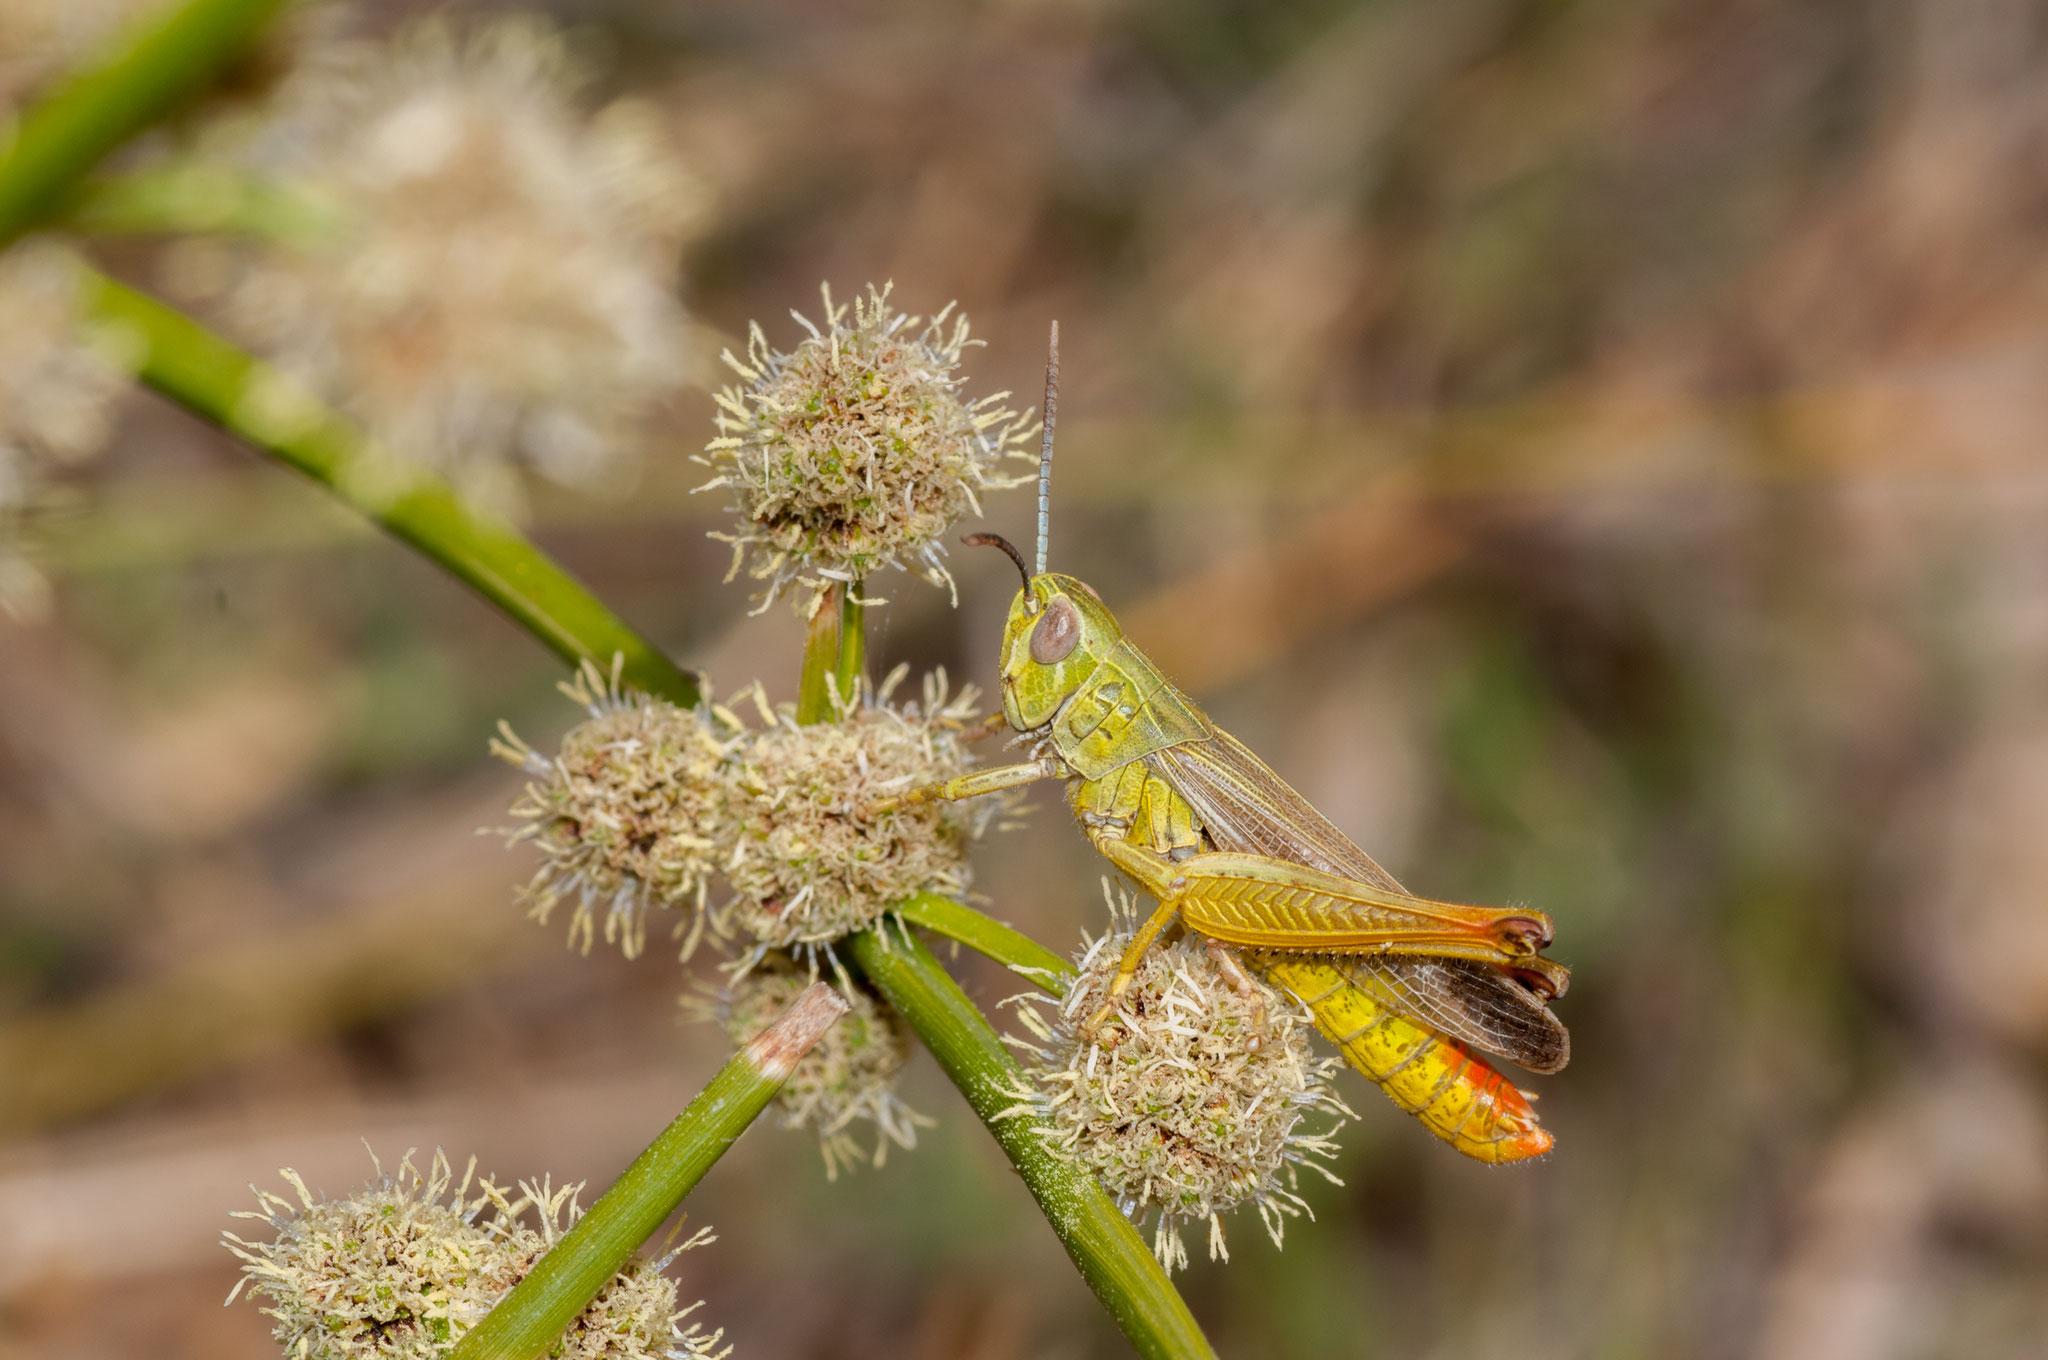 Chorthippus apicalis